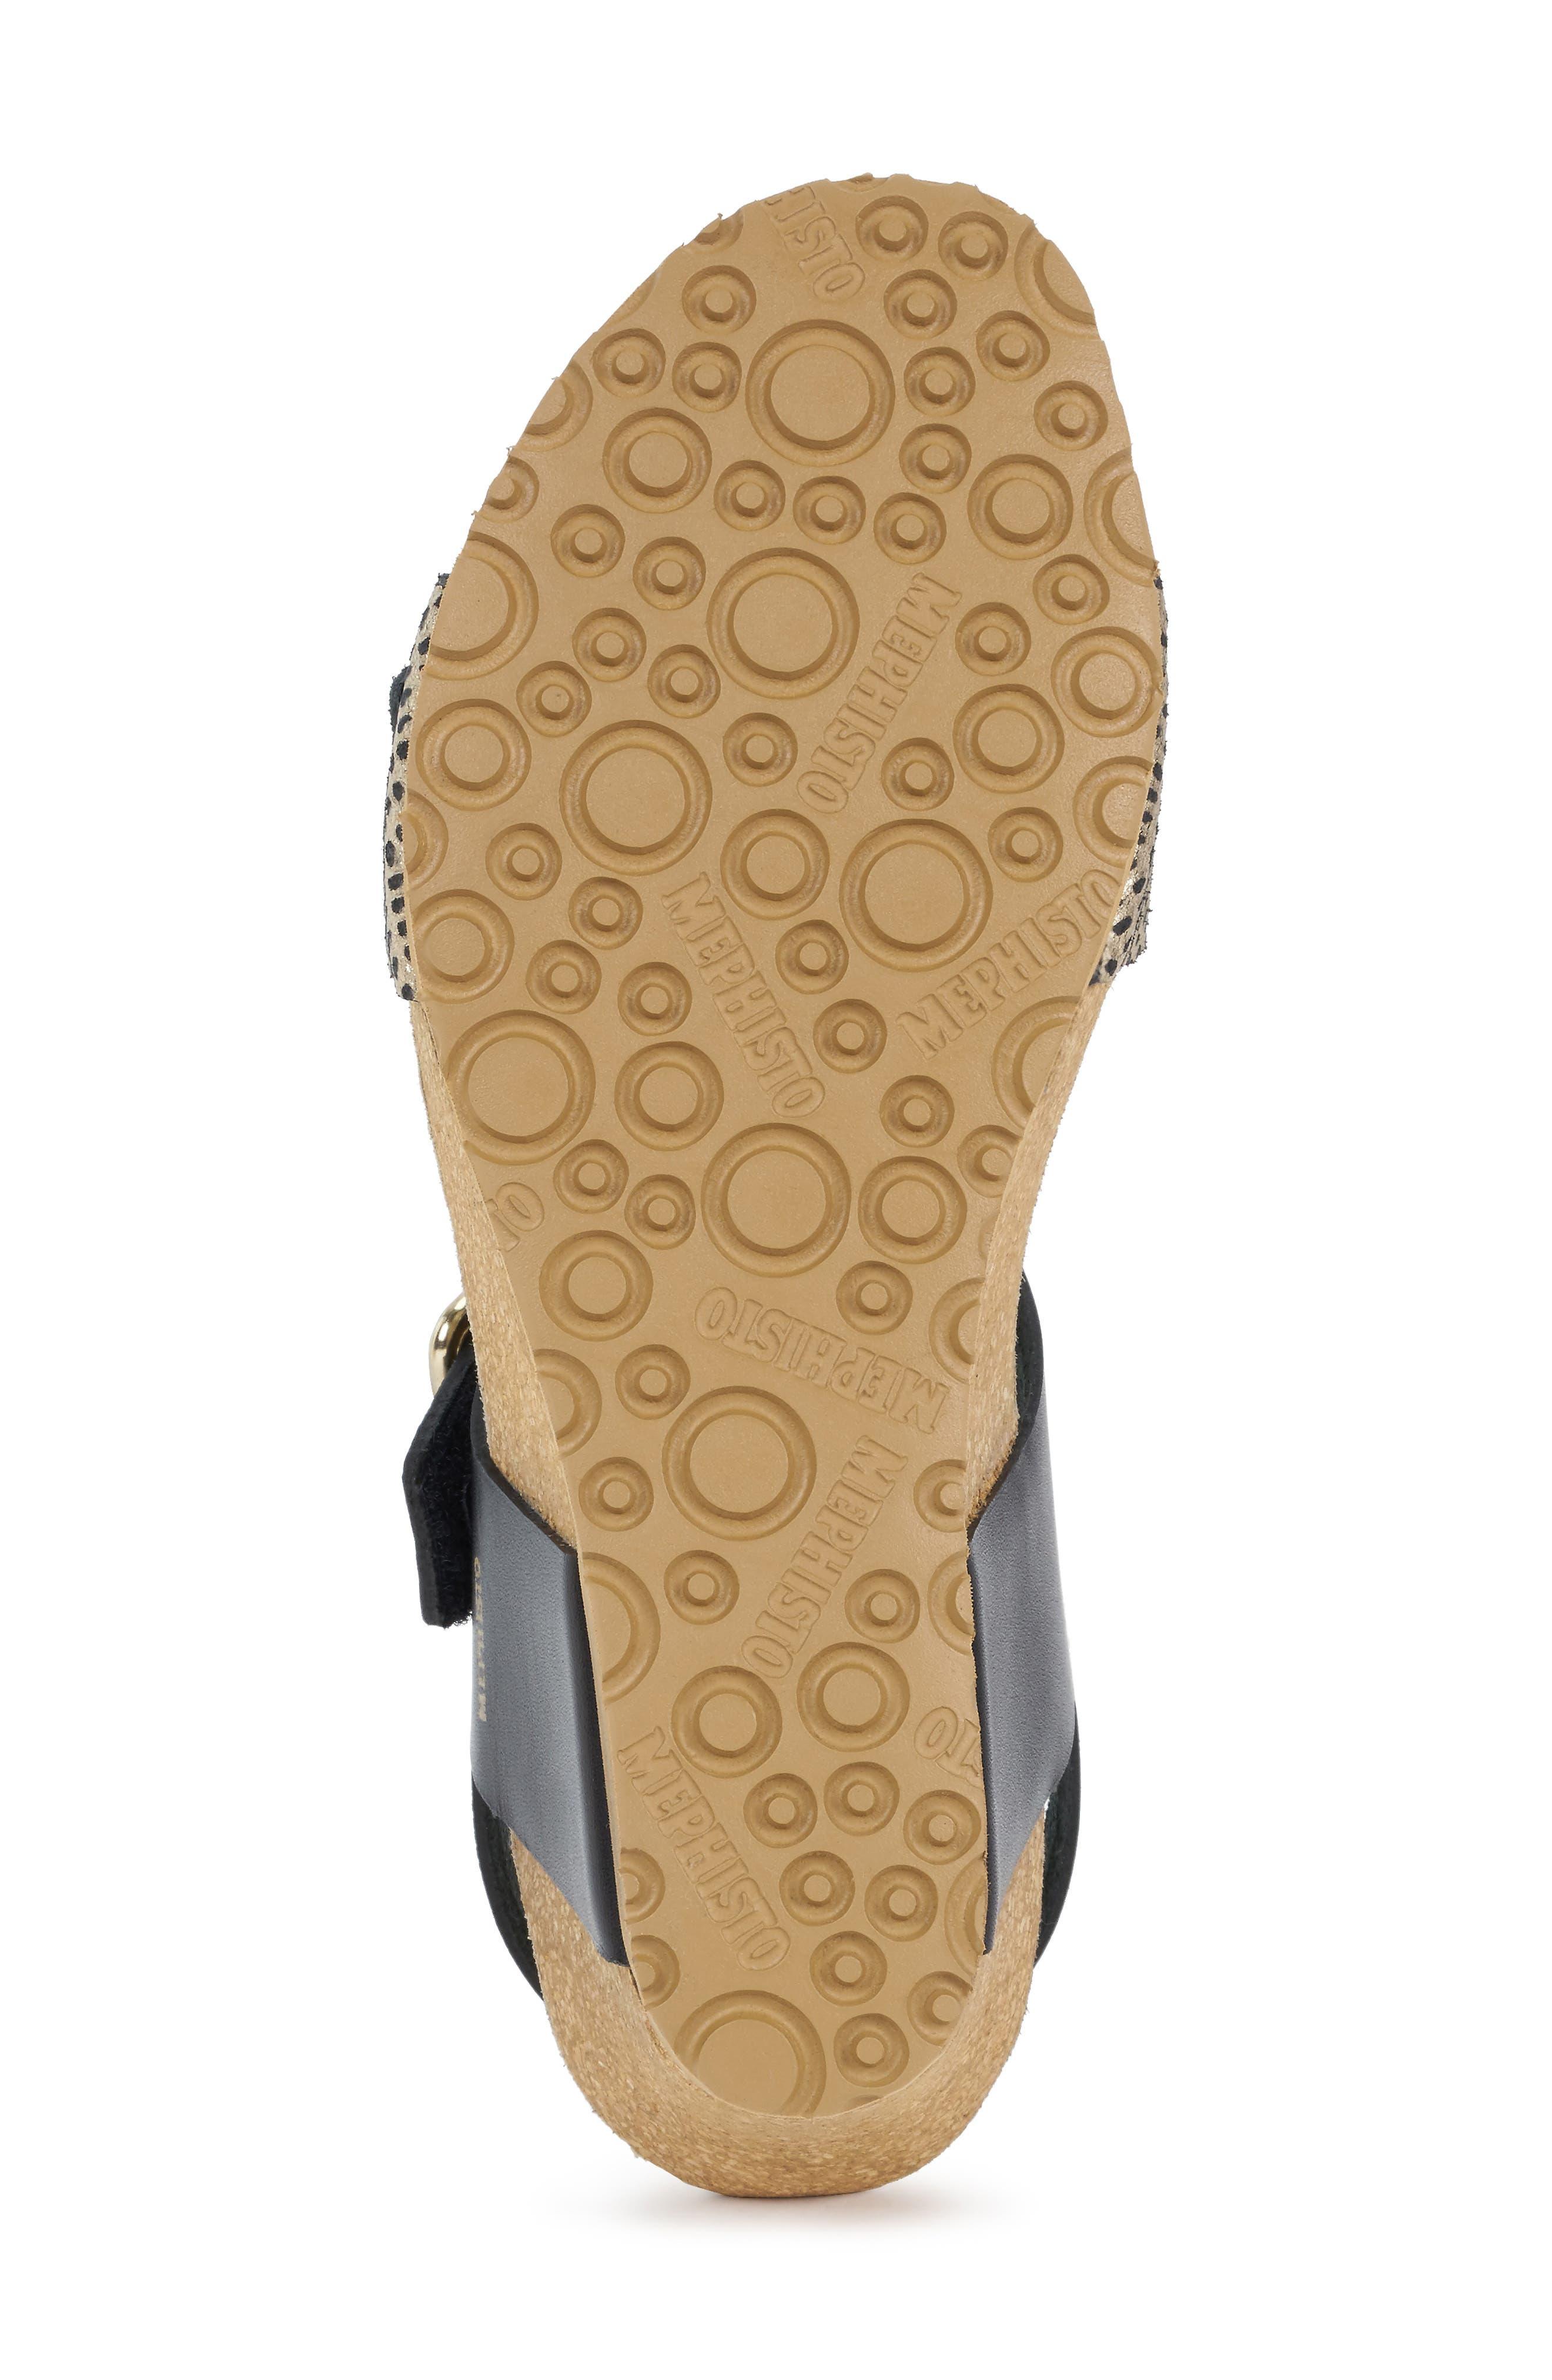 Lissandra Platform Wedge Sandal,                             Alternate thumbnail 6, color,                             BLACK/ GOLD LEATHER